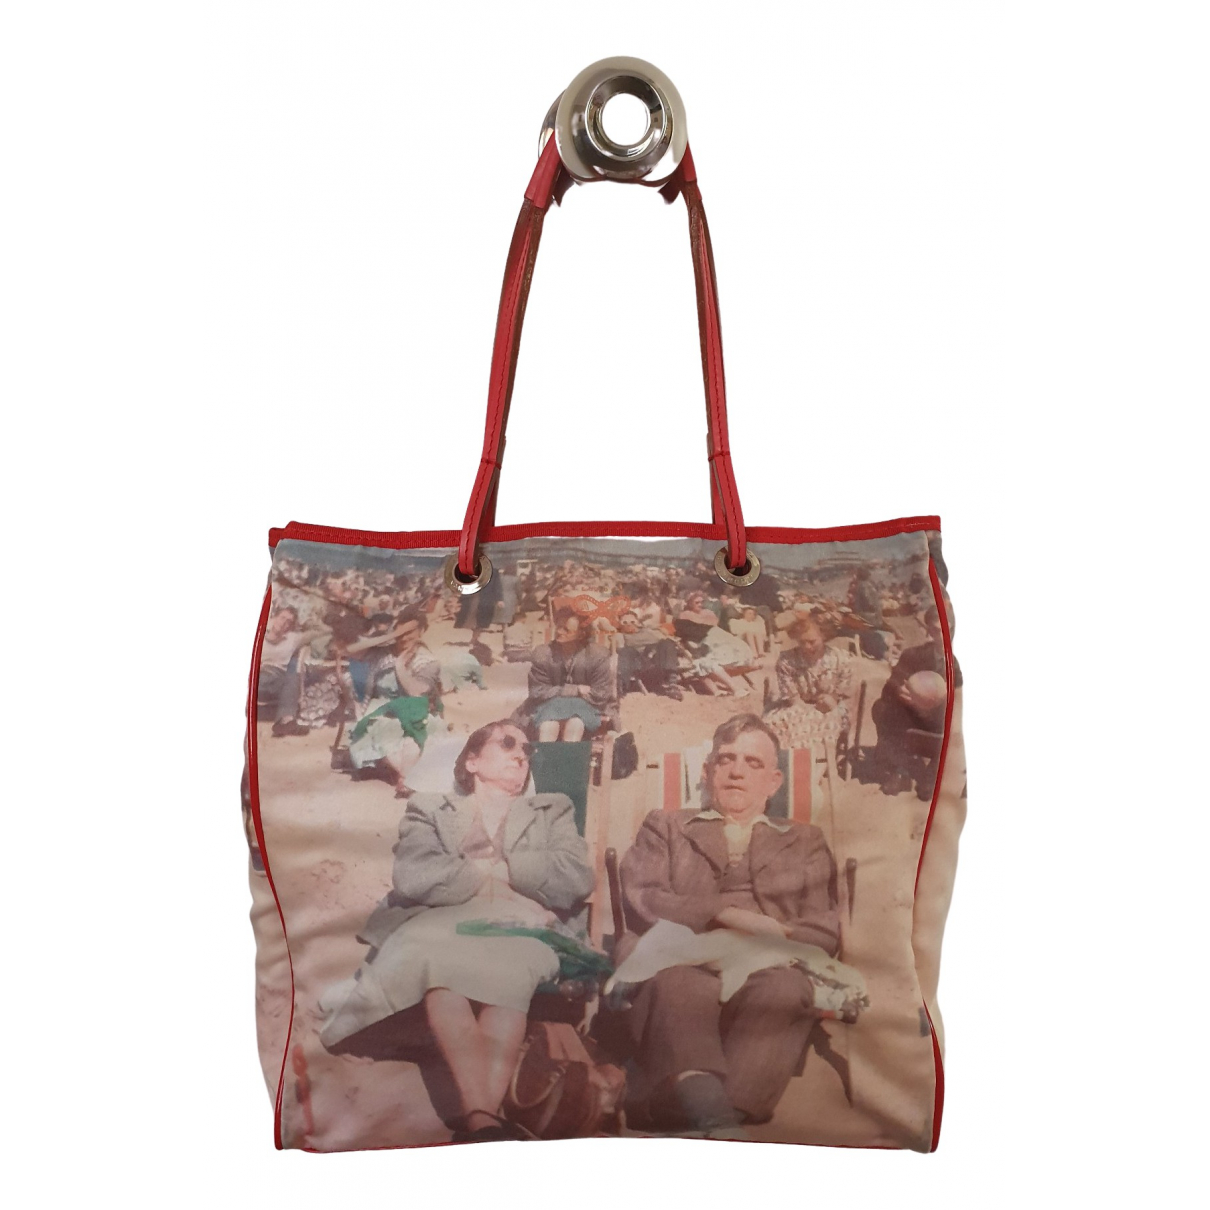 Anya Hindmarch \N Handtasche in  Bunt Leinen